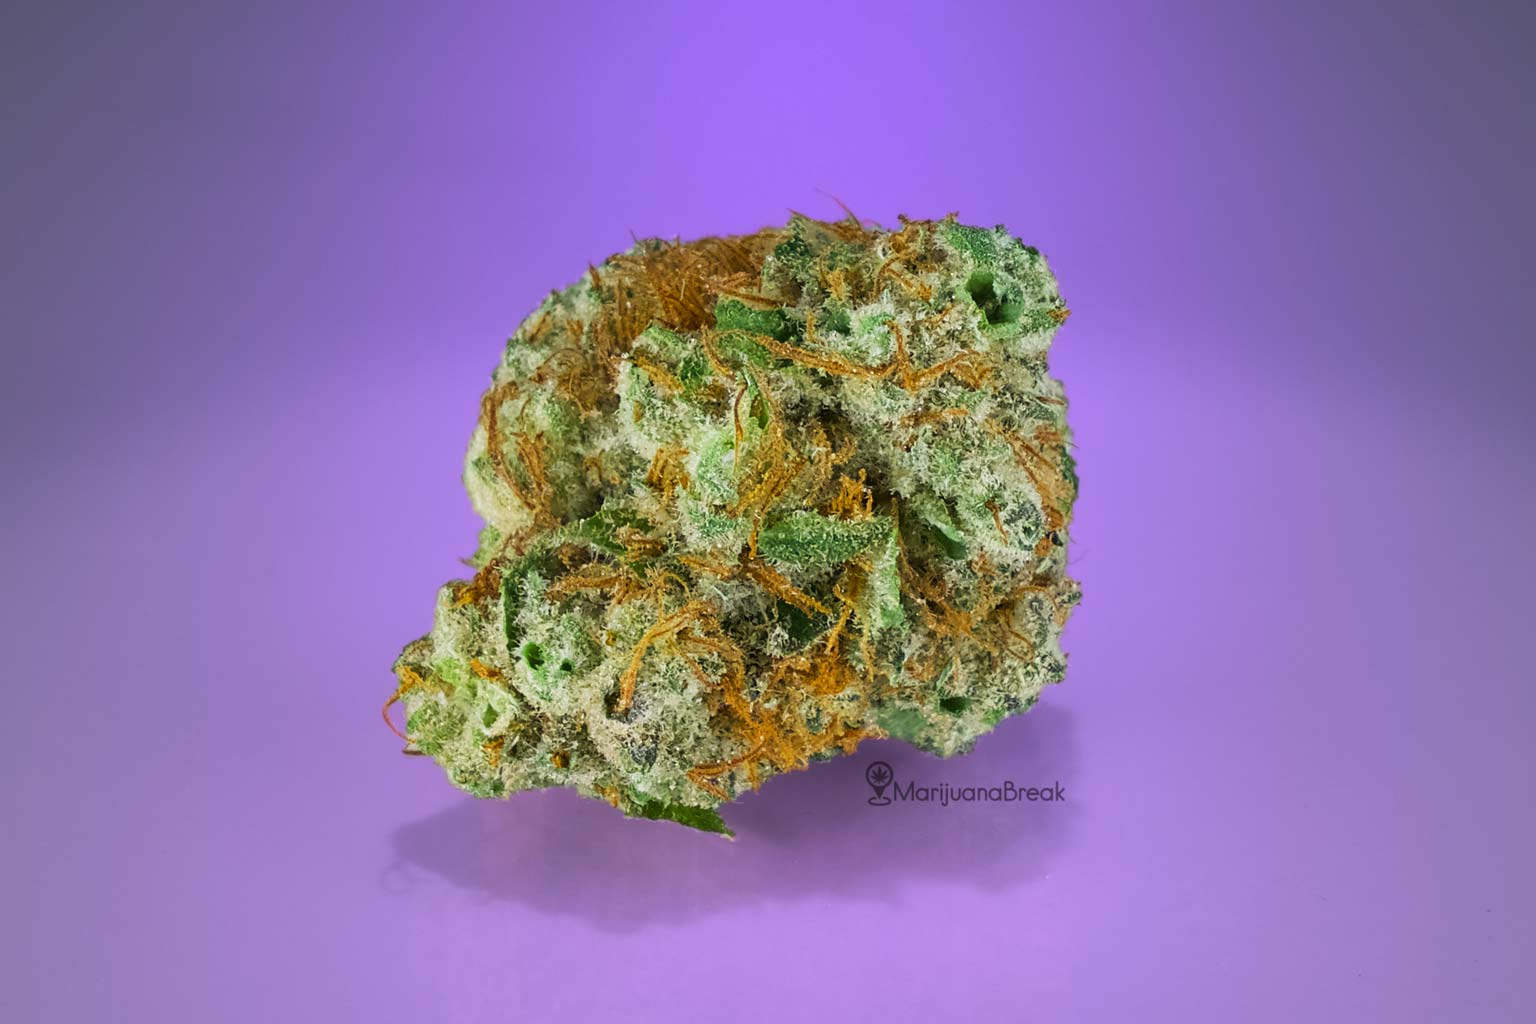 shiva skunk cannabis strain